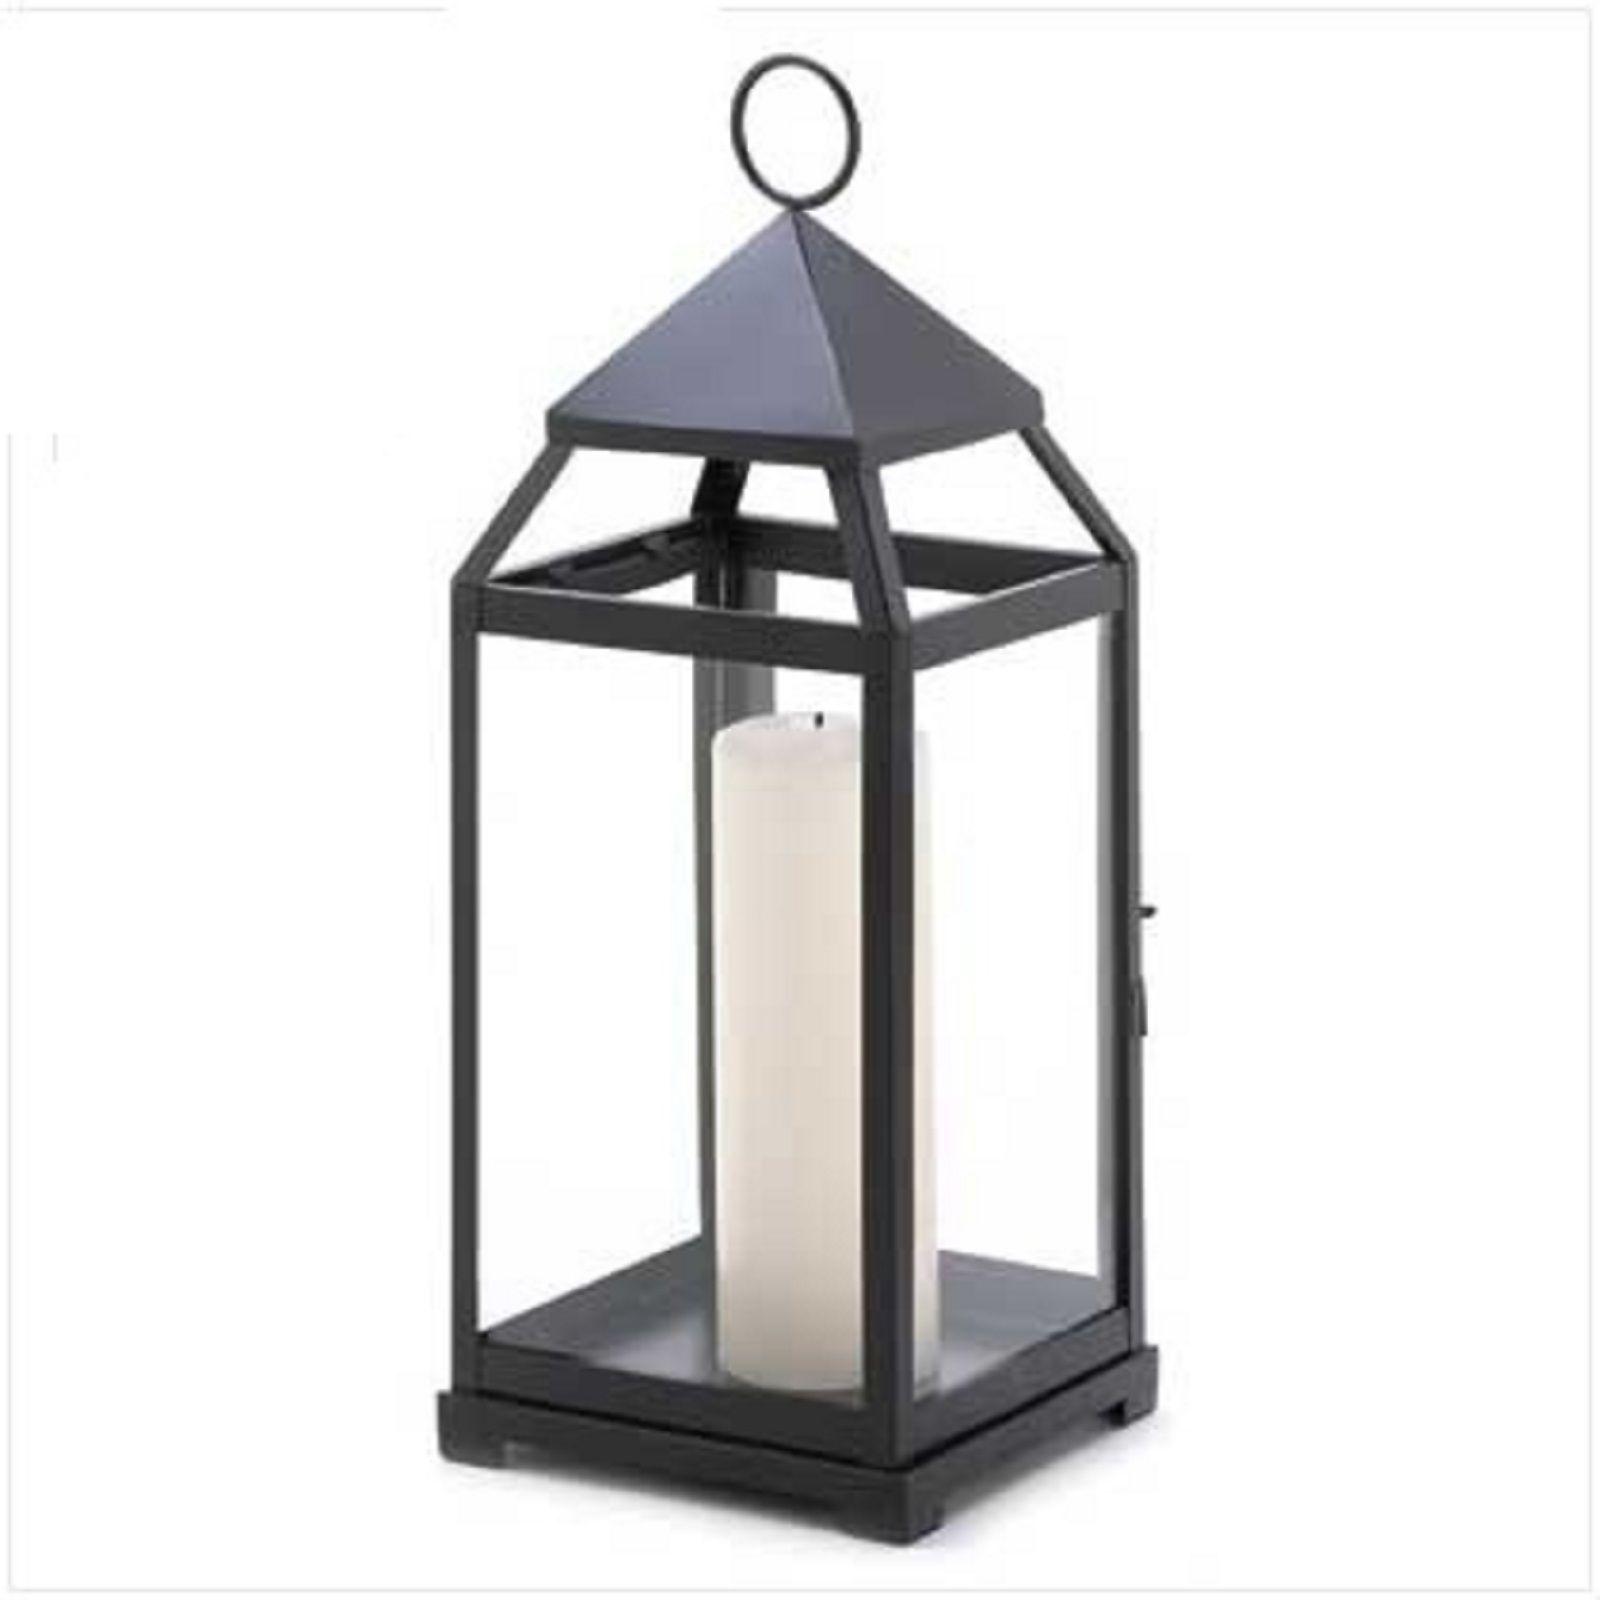 "Large Black Candle Lantern Candleholder Candle Holder Centerpiece 17 1/2"" Tall"